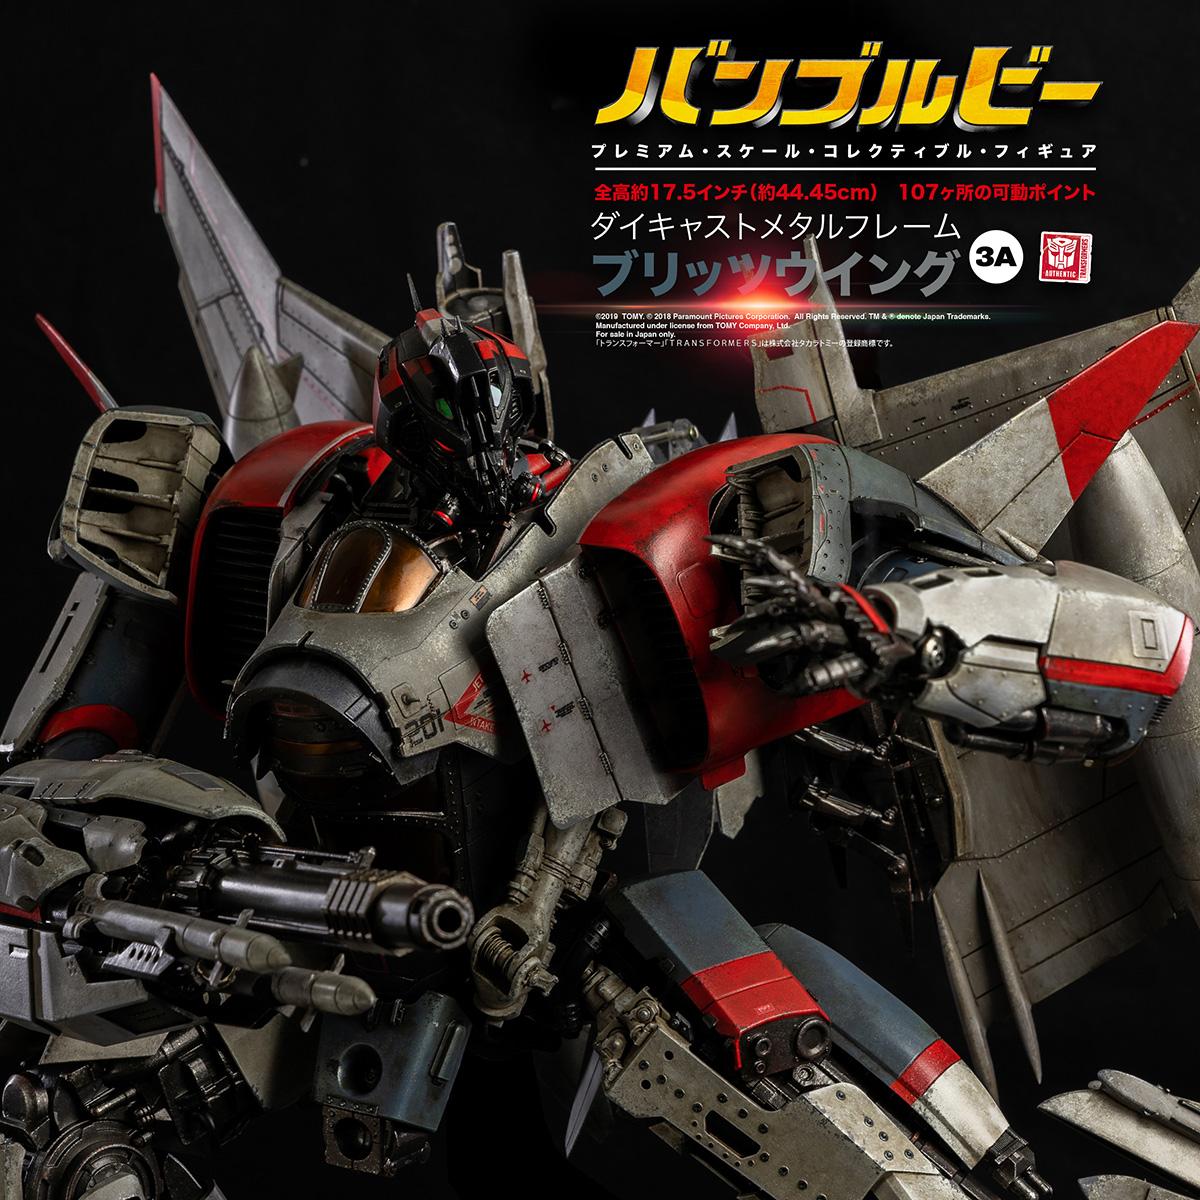 Blitzwing_PM_JAP_1137.jpg